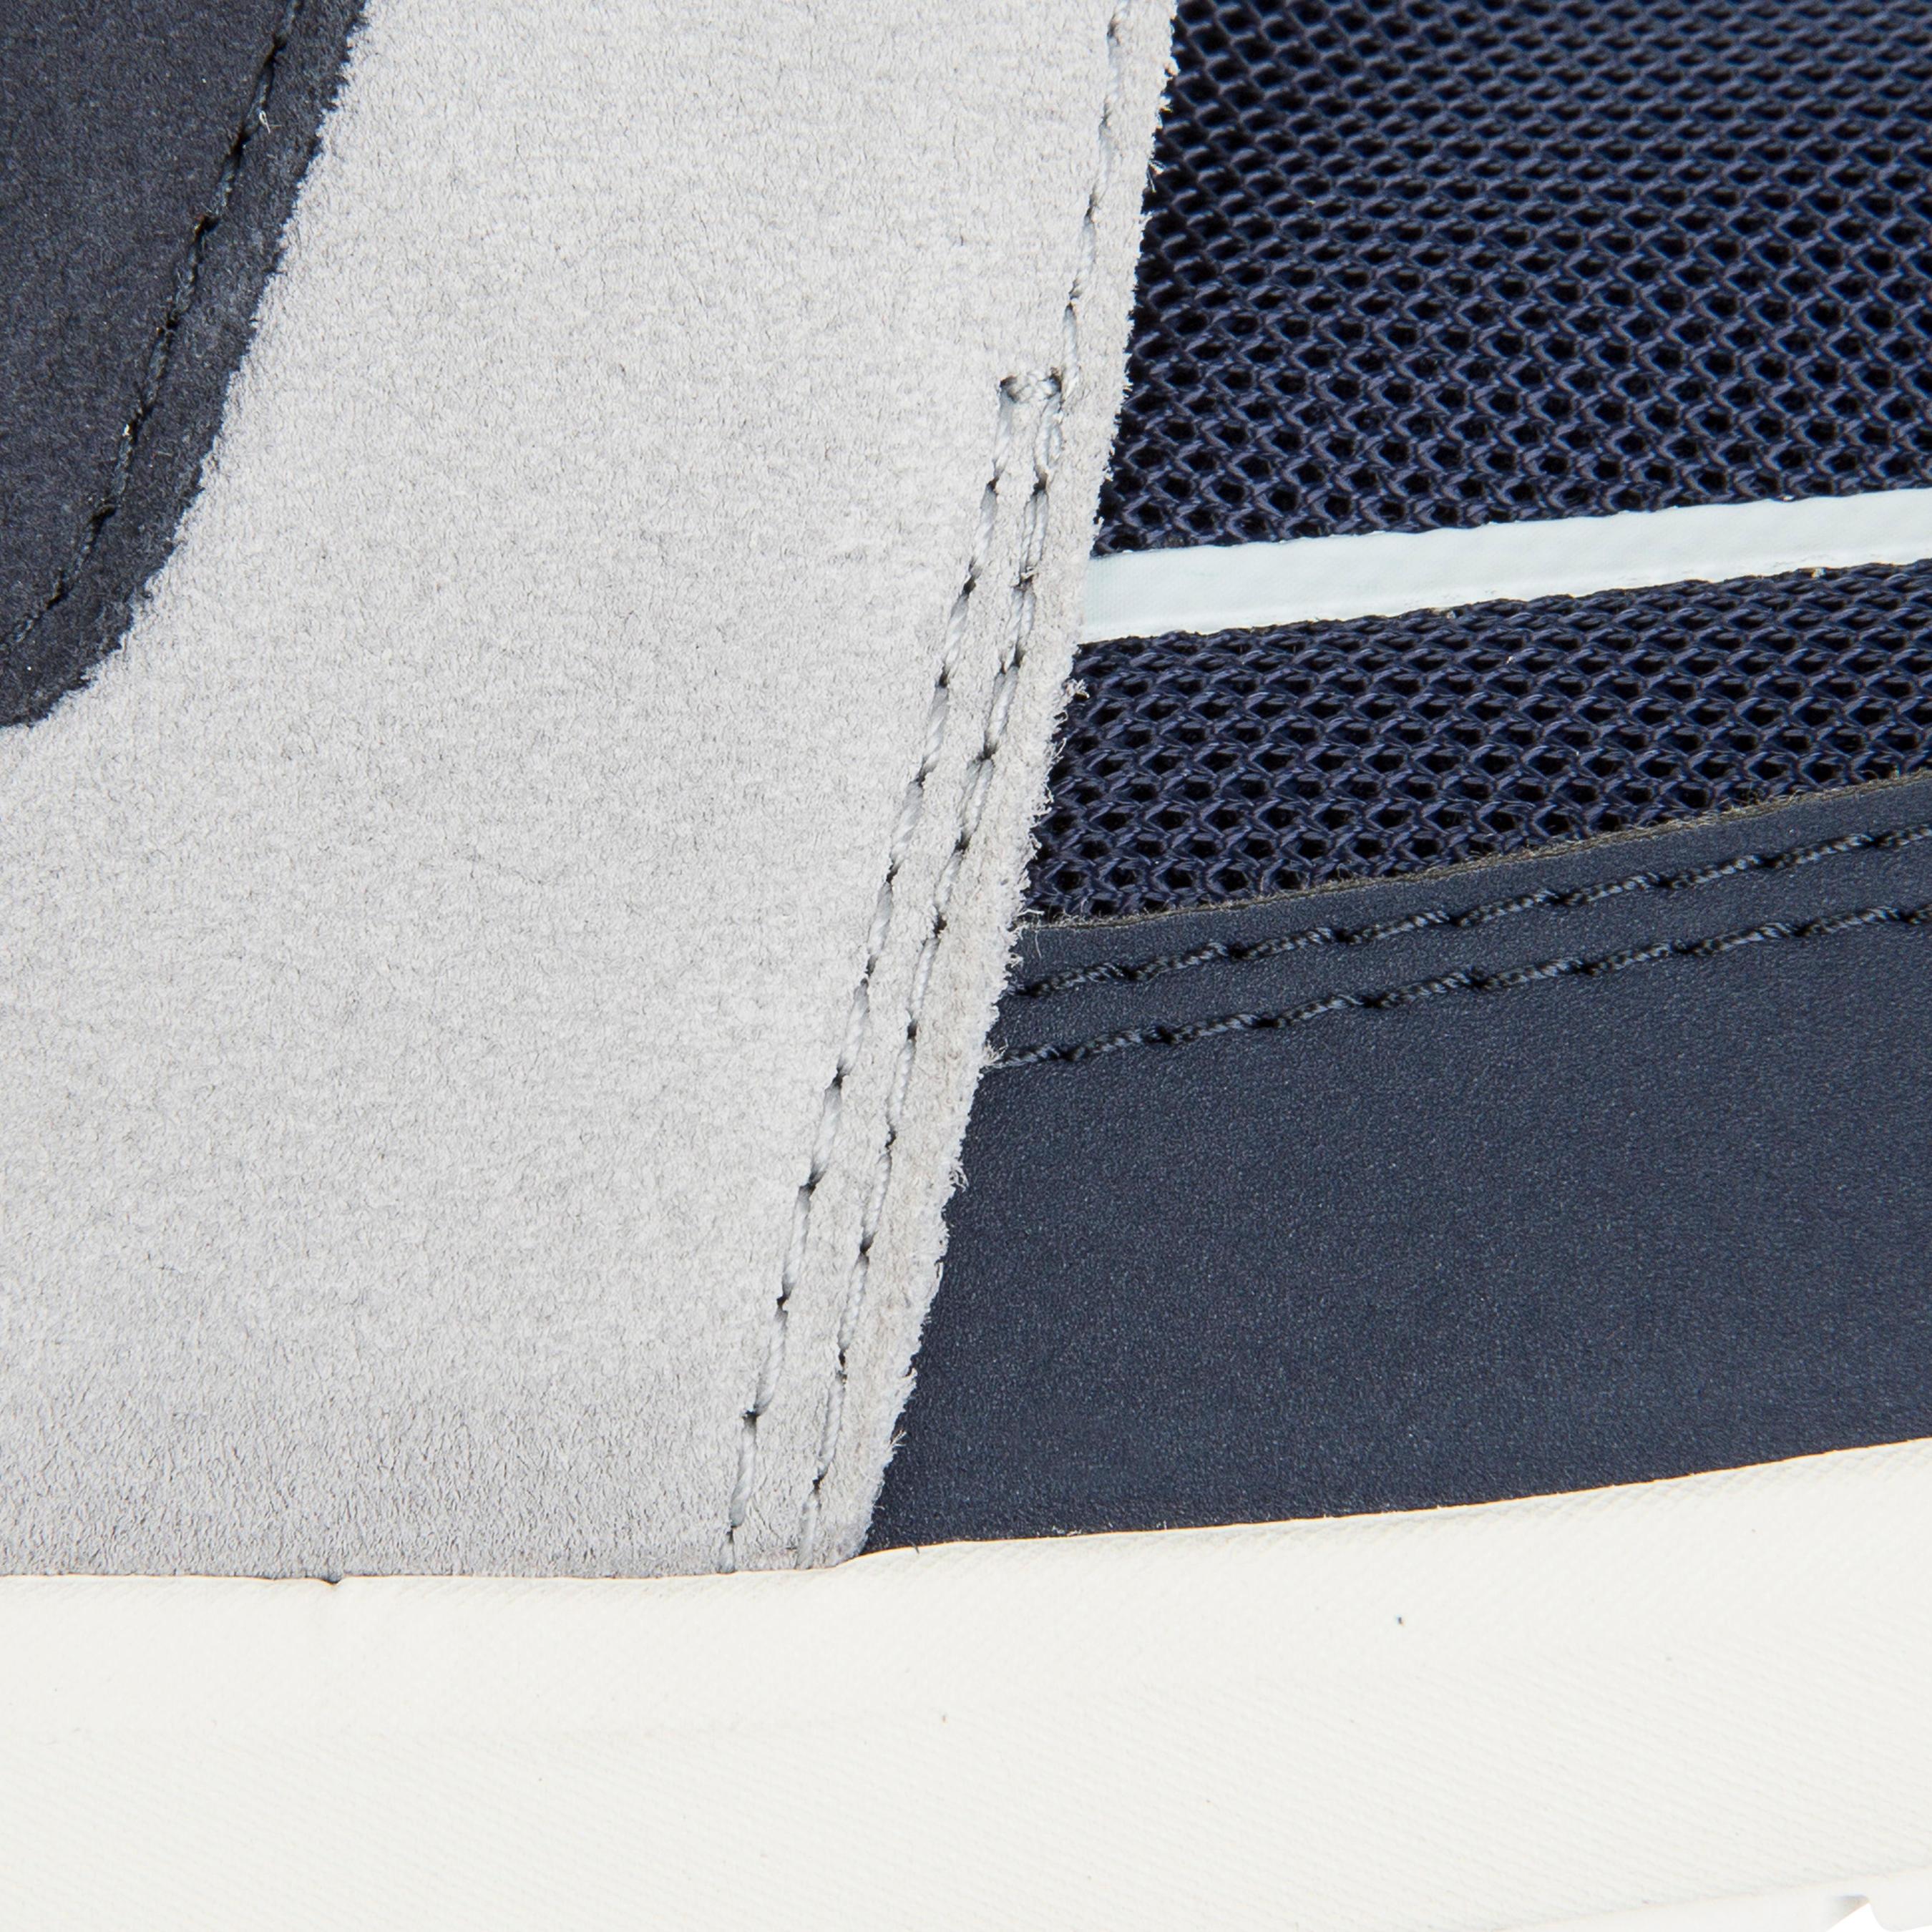 Chaussures Bleu Homme Marine Bateau Sailing100 80wONynmv